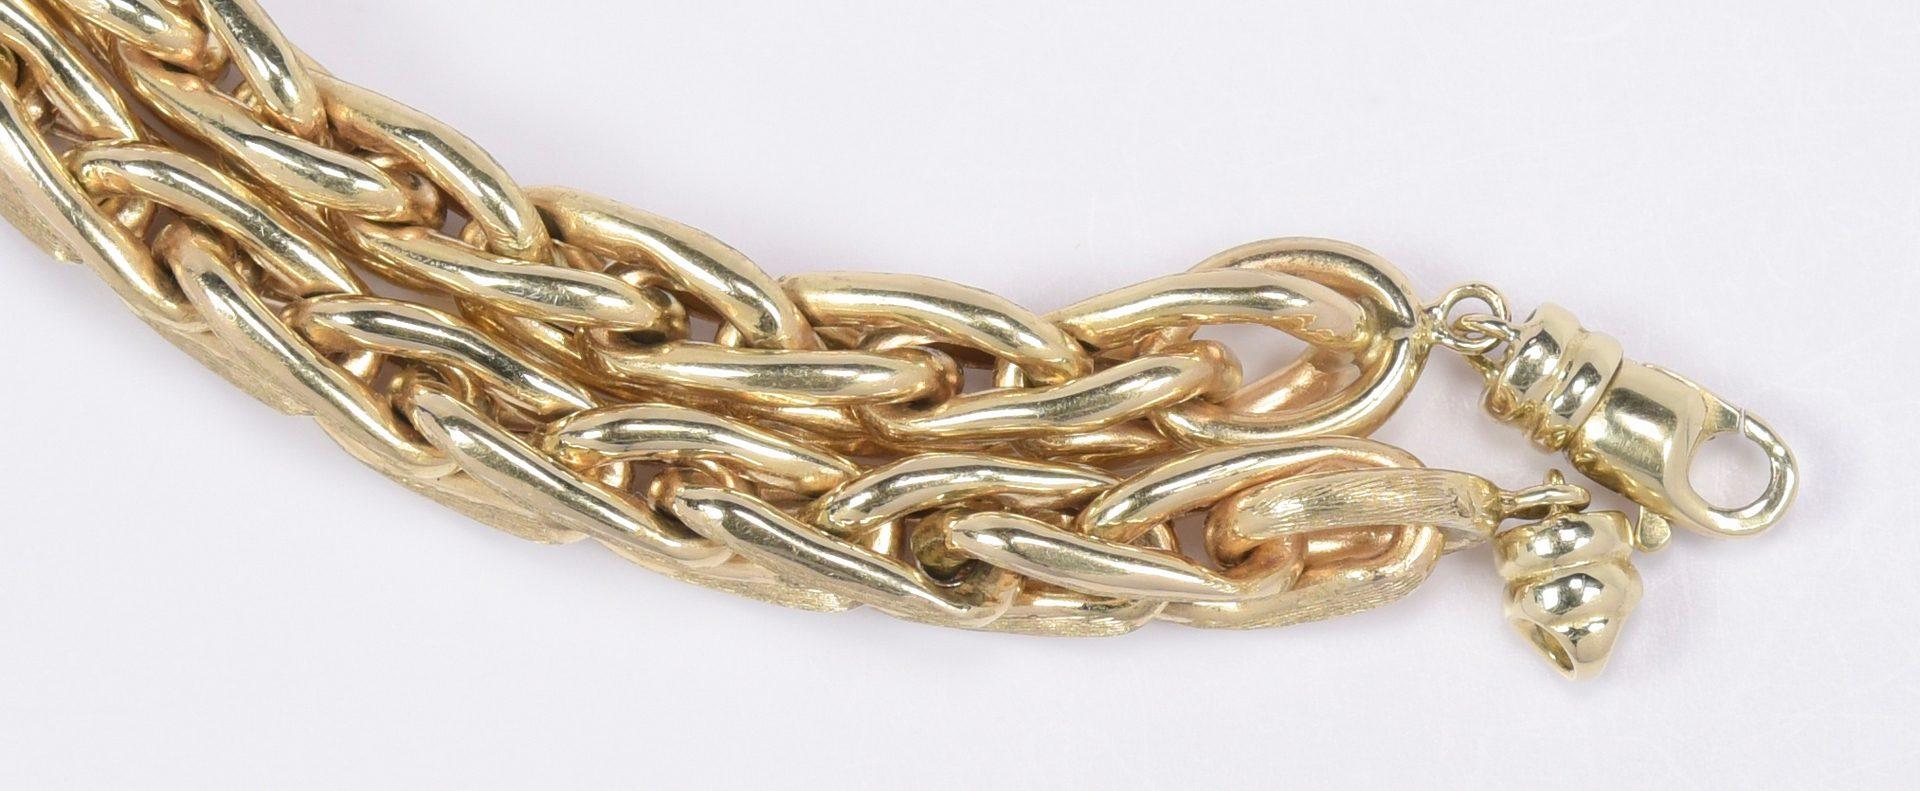 Lot 411: 14K Italian Wheat Necklace, 59 grams